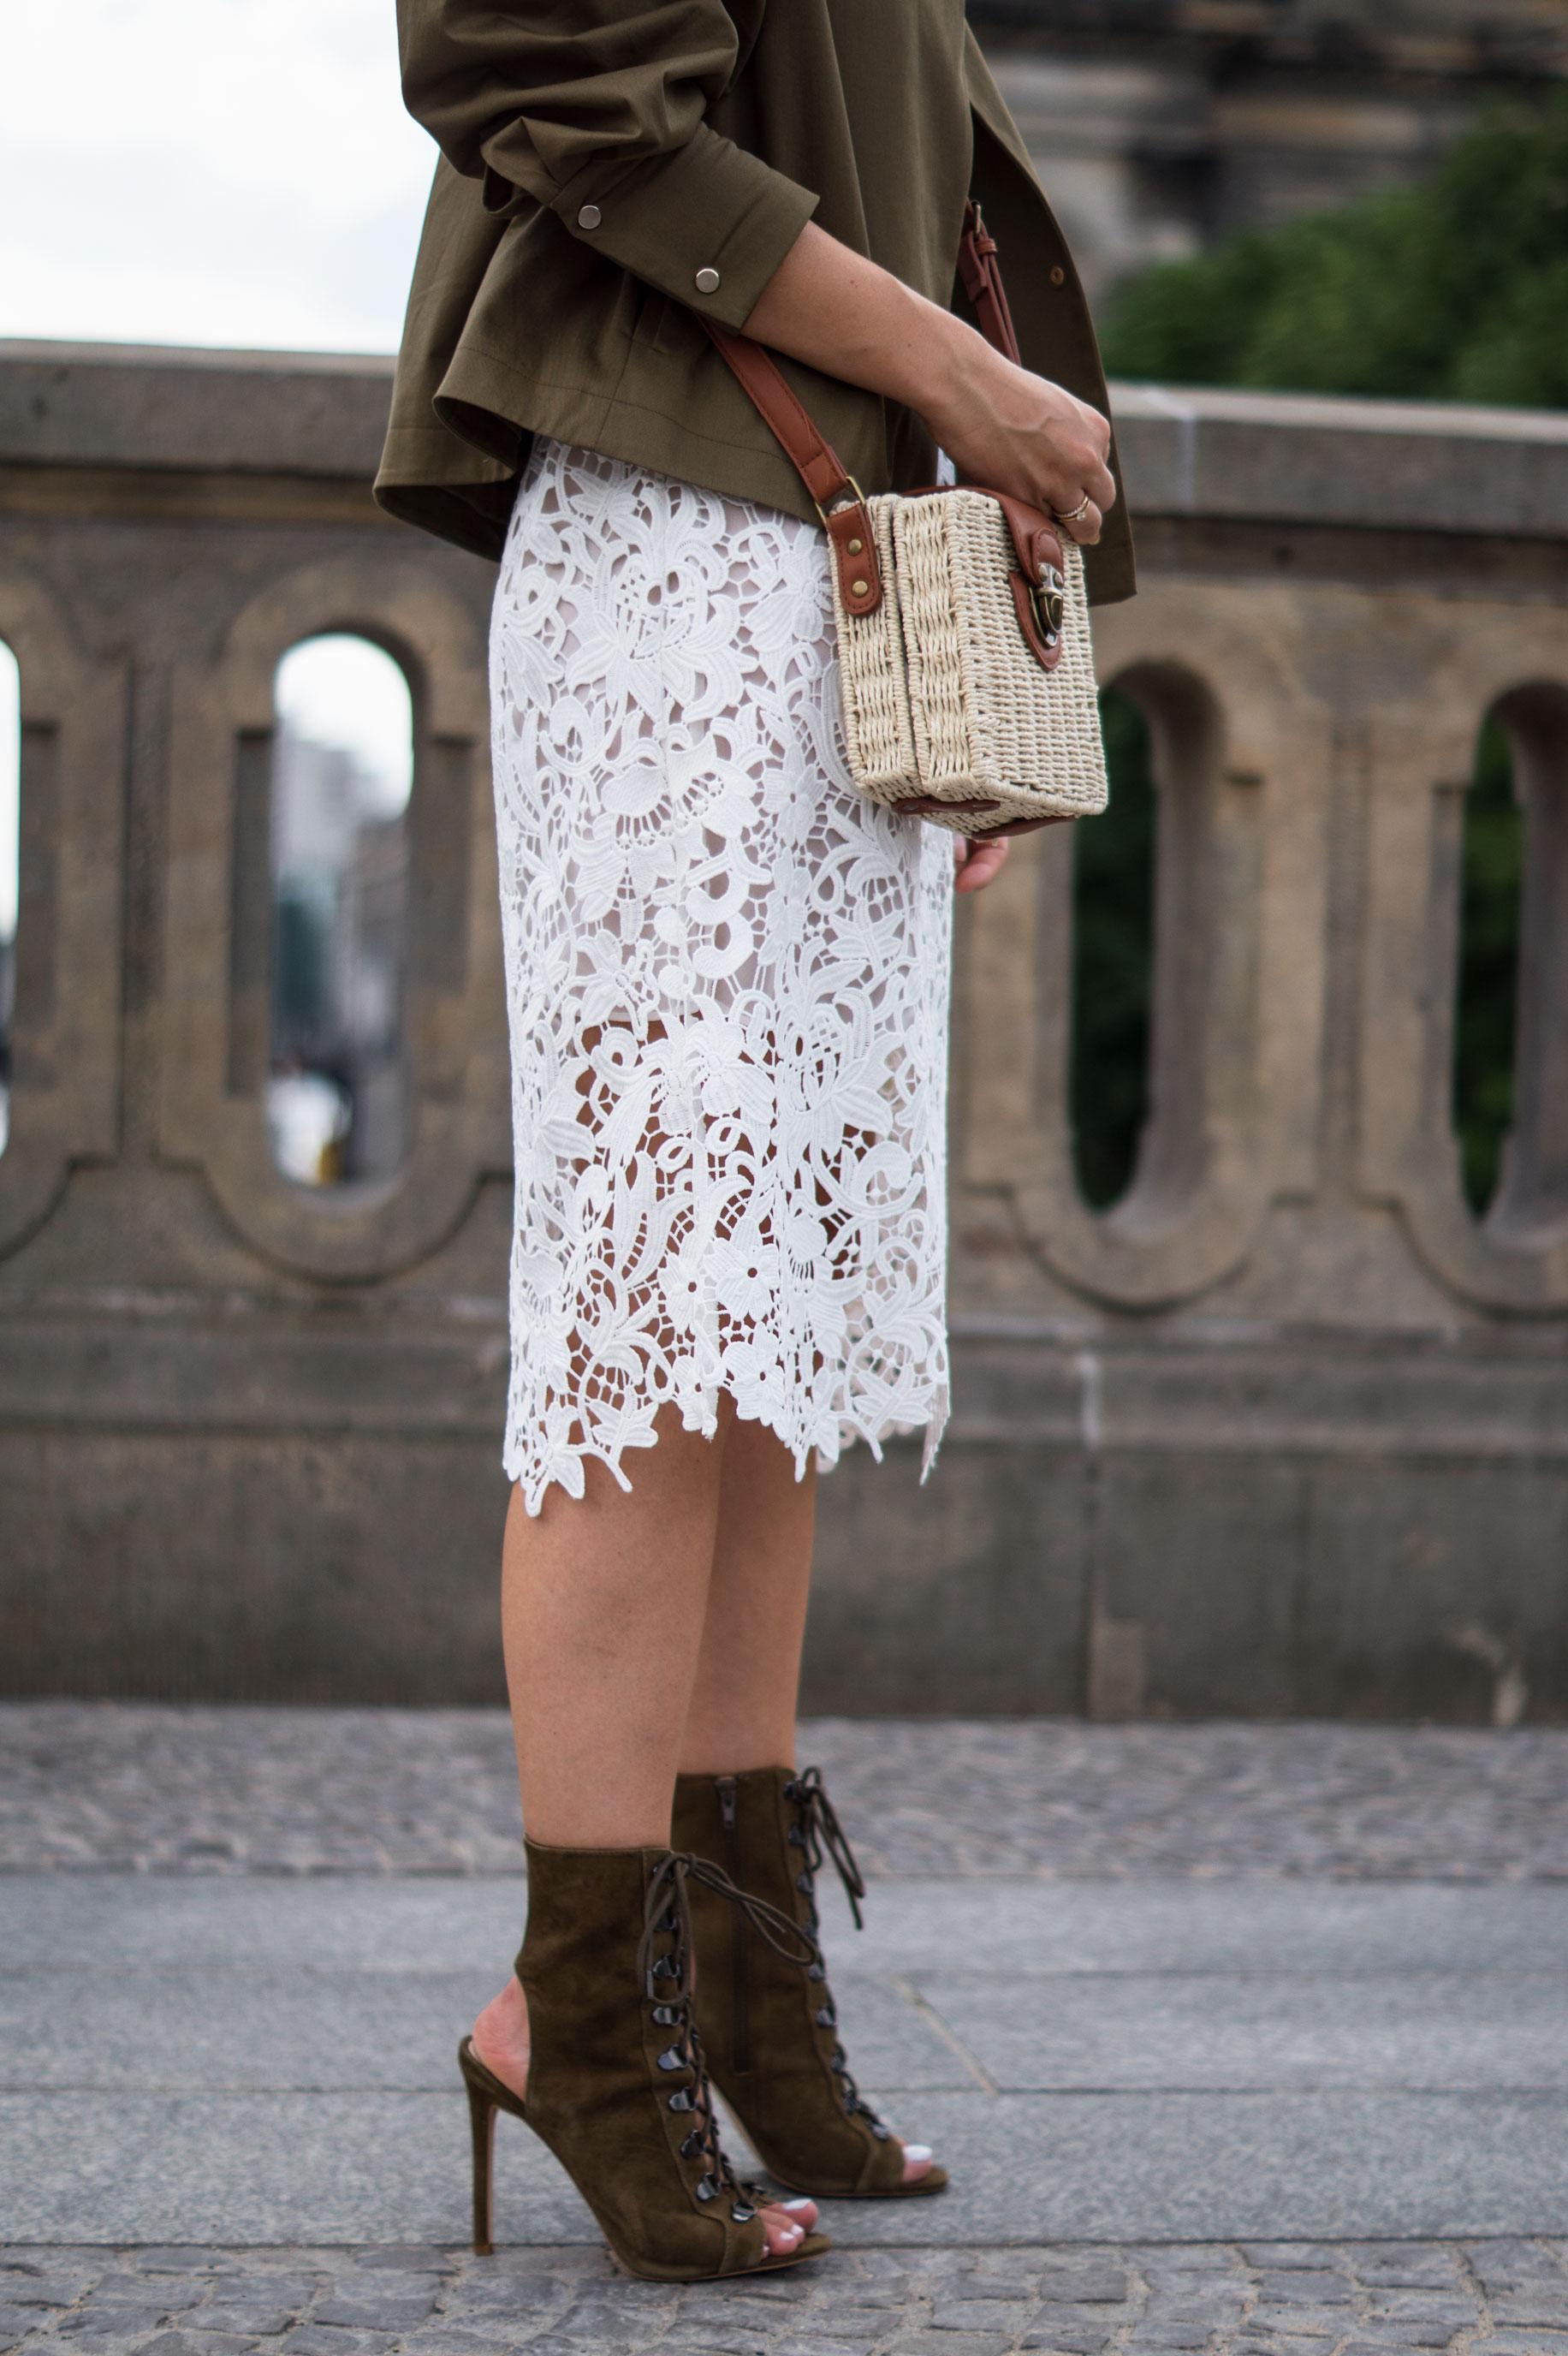 d745bb71b Puff Sleeve Jacket Mango Zara Lace Dress White Sariety Fashionblogger Lace  Up Heels Steve Madden Stilettos Puffärmel Korbtasche Basket Bag Berlin  Modeblog ...